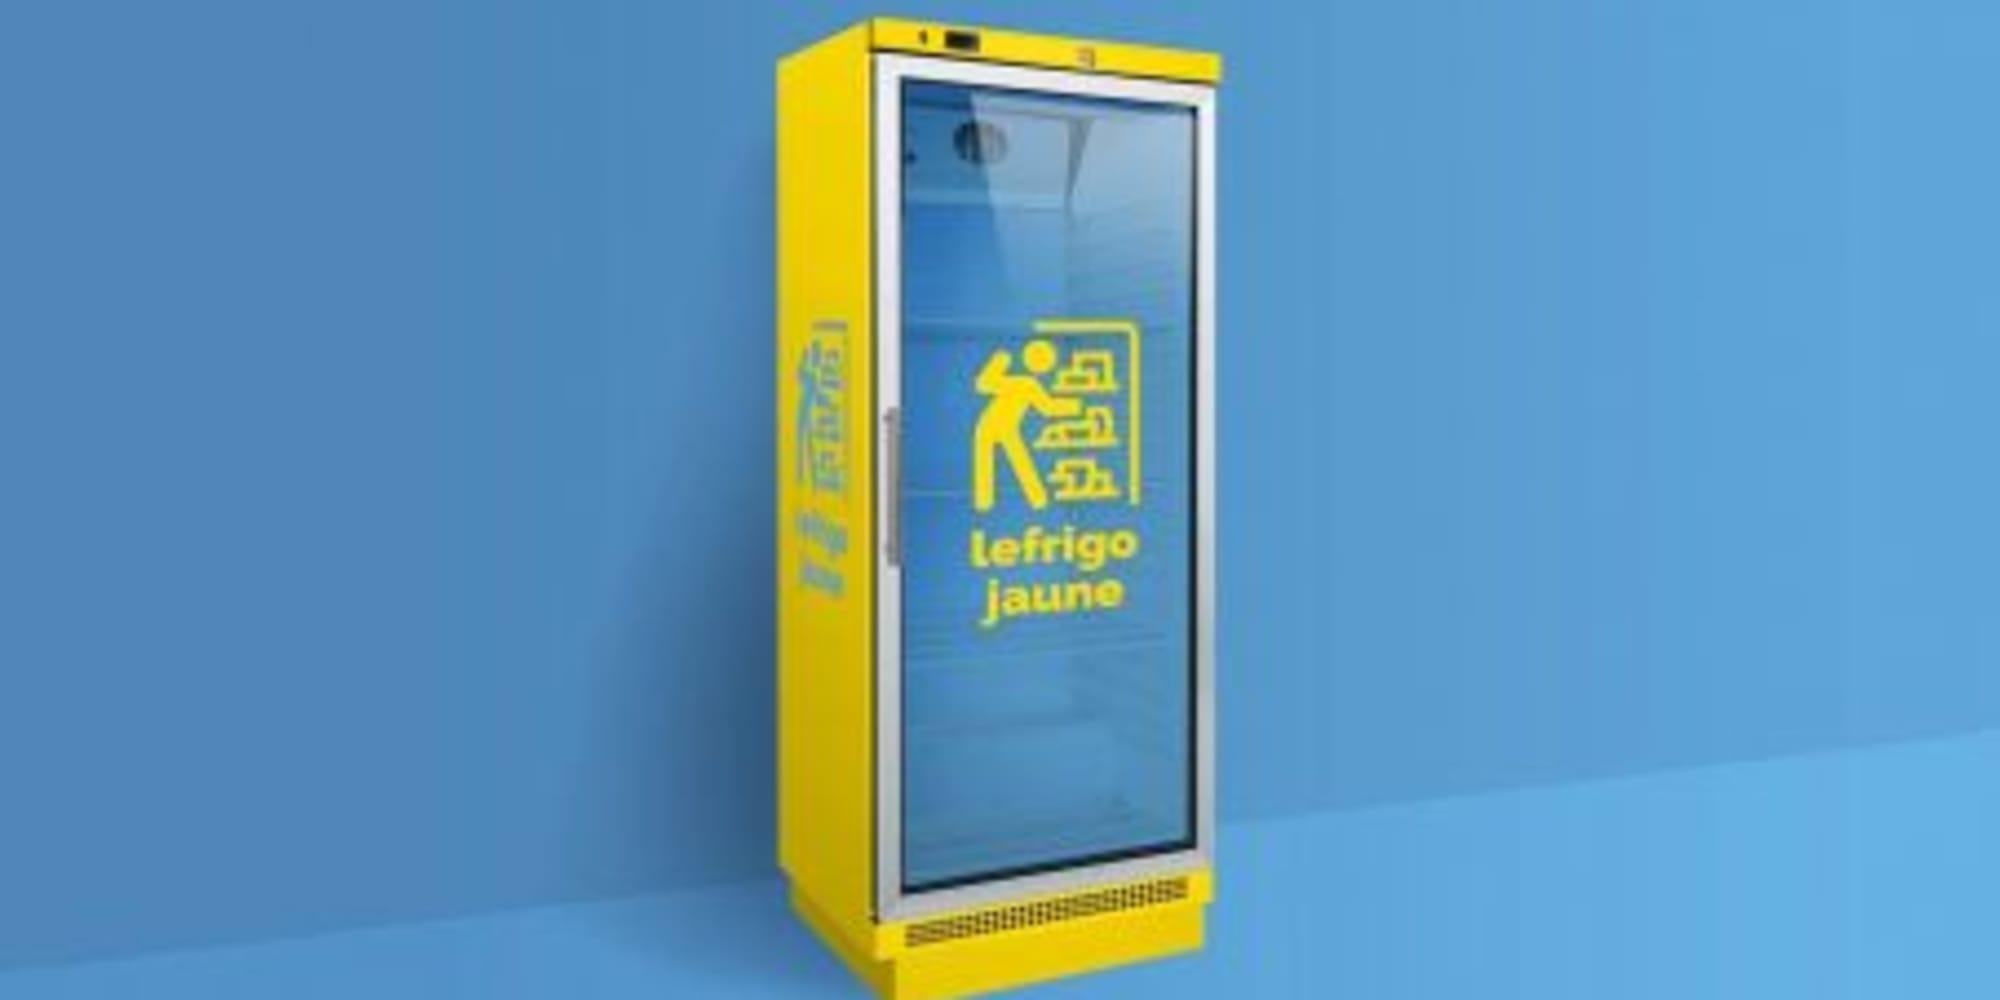 Refrigerateur jaune for Poltronesofa strasbourg